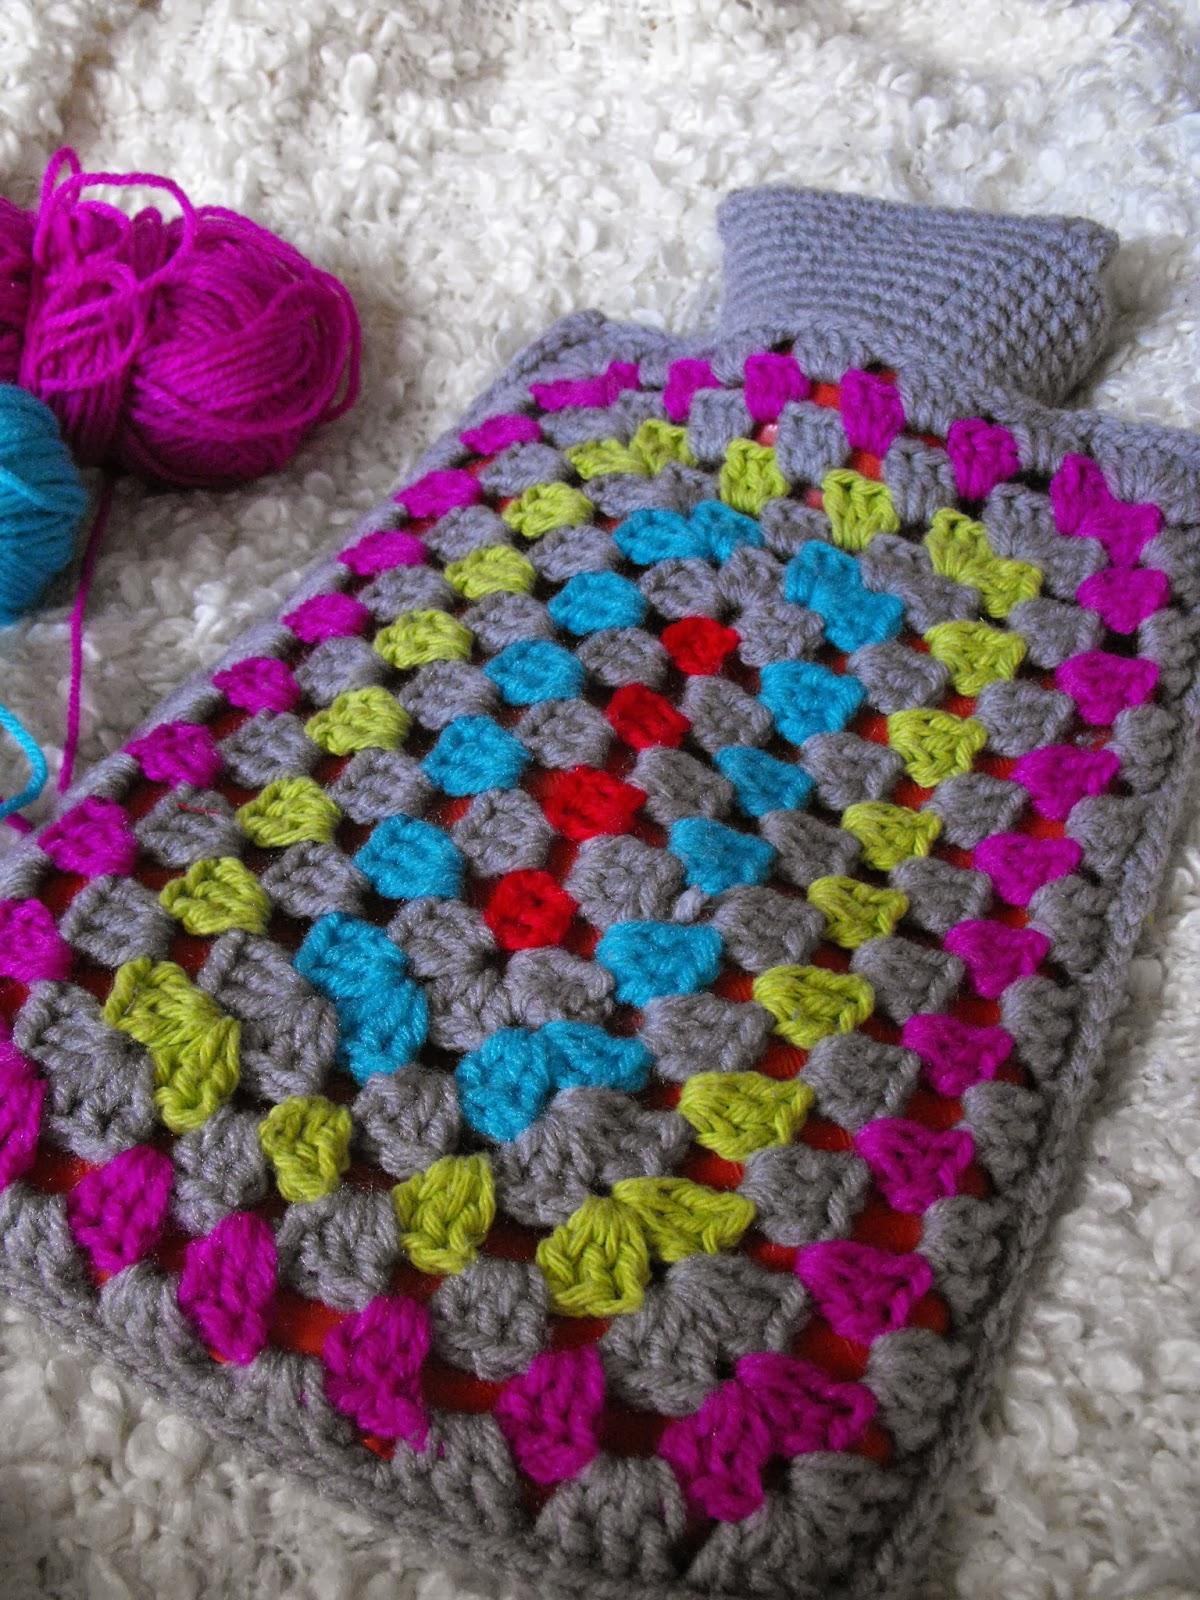 Free Knitting Or Crochet Pattern For Hot Water Bottle Cover : Ruby Murrays Musings: Crochet: Granny Rectangle Hottie